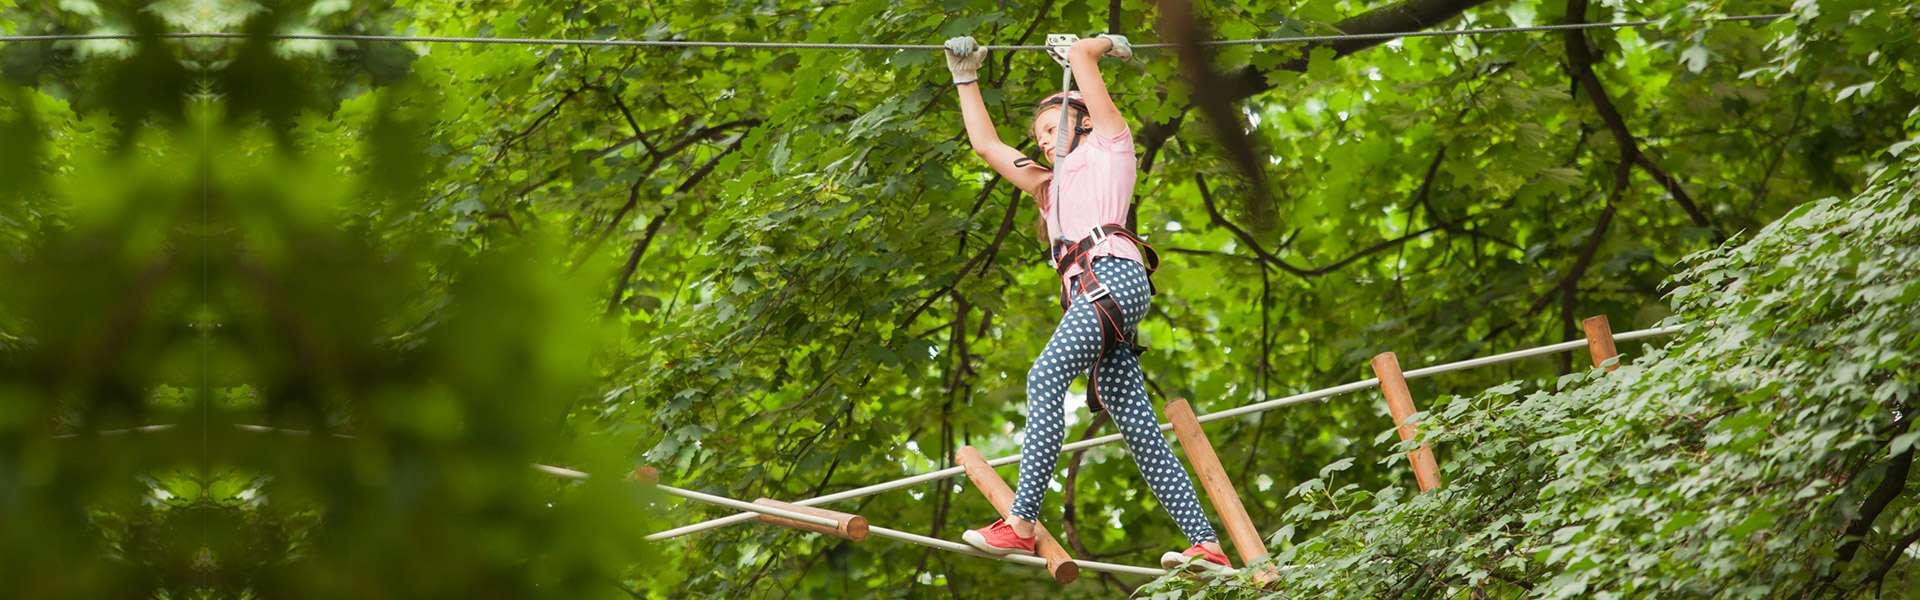 Oberlausitzer Dreieck - Fun & Action